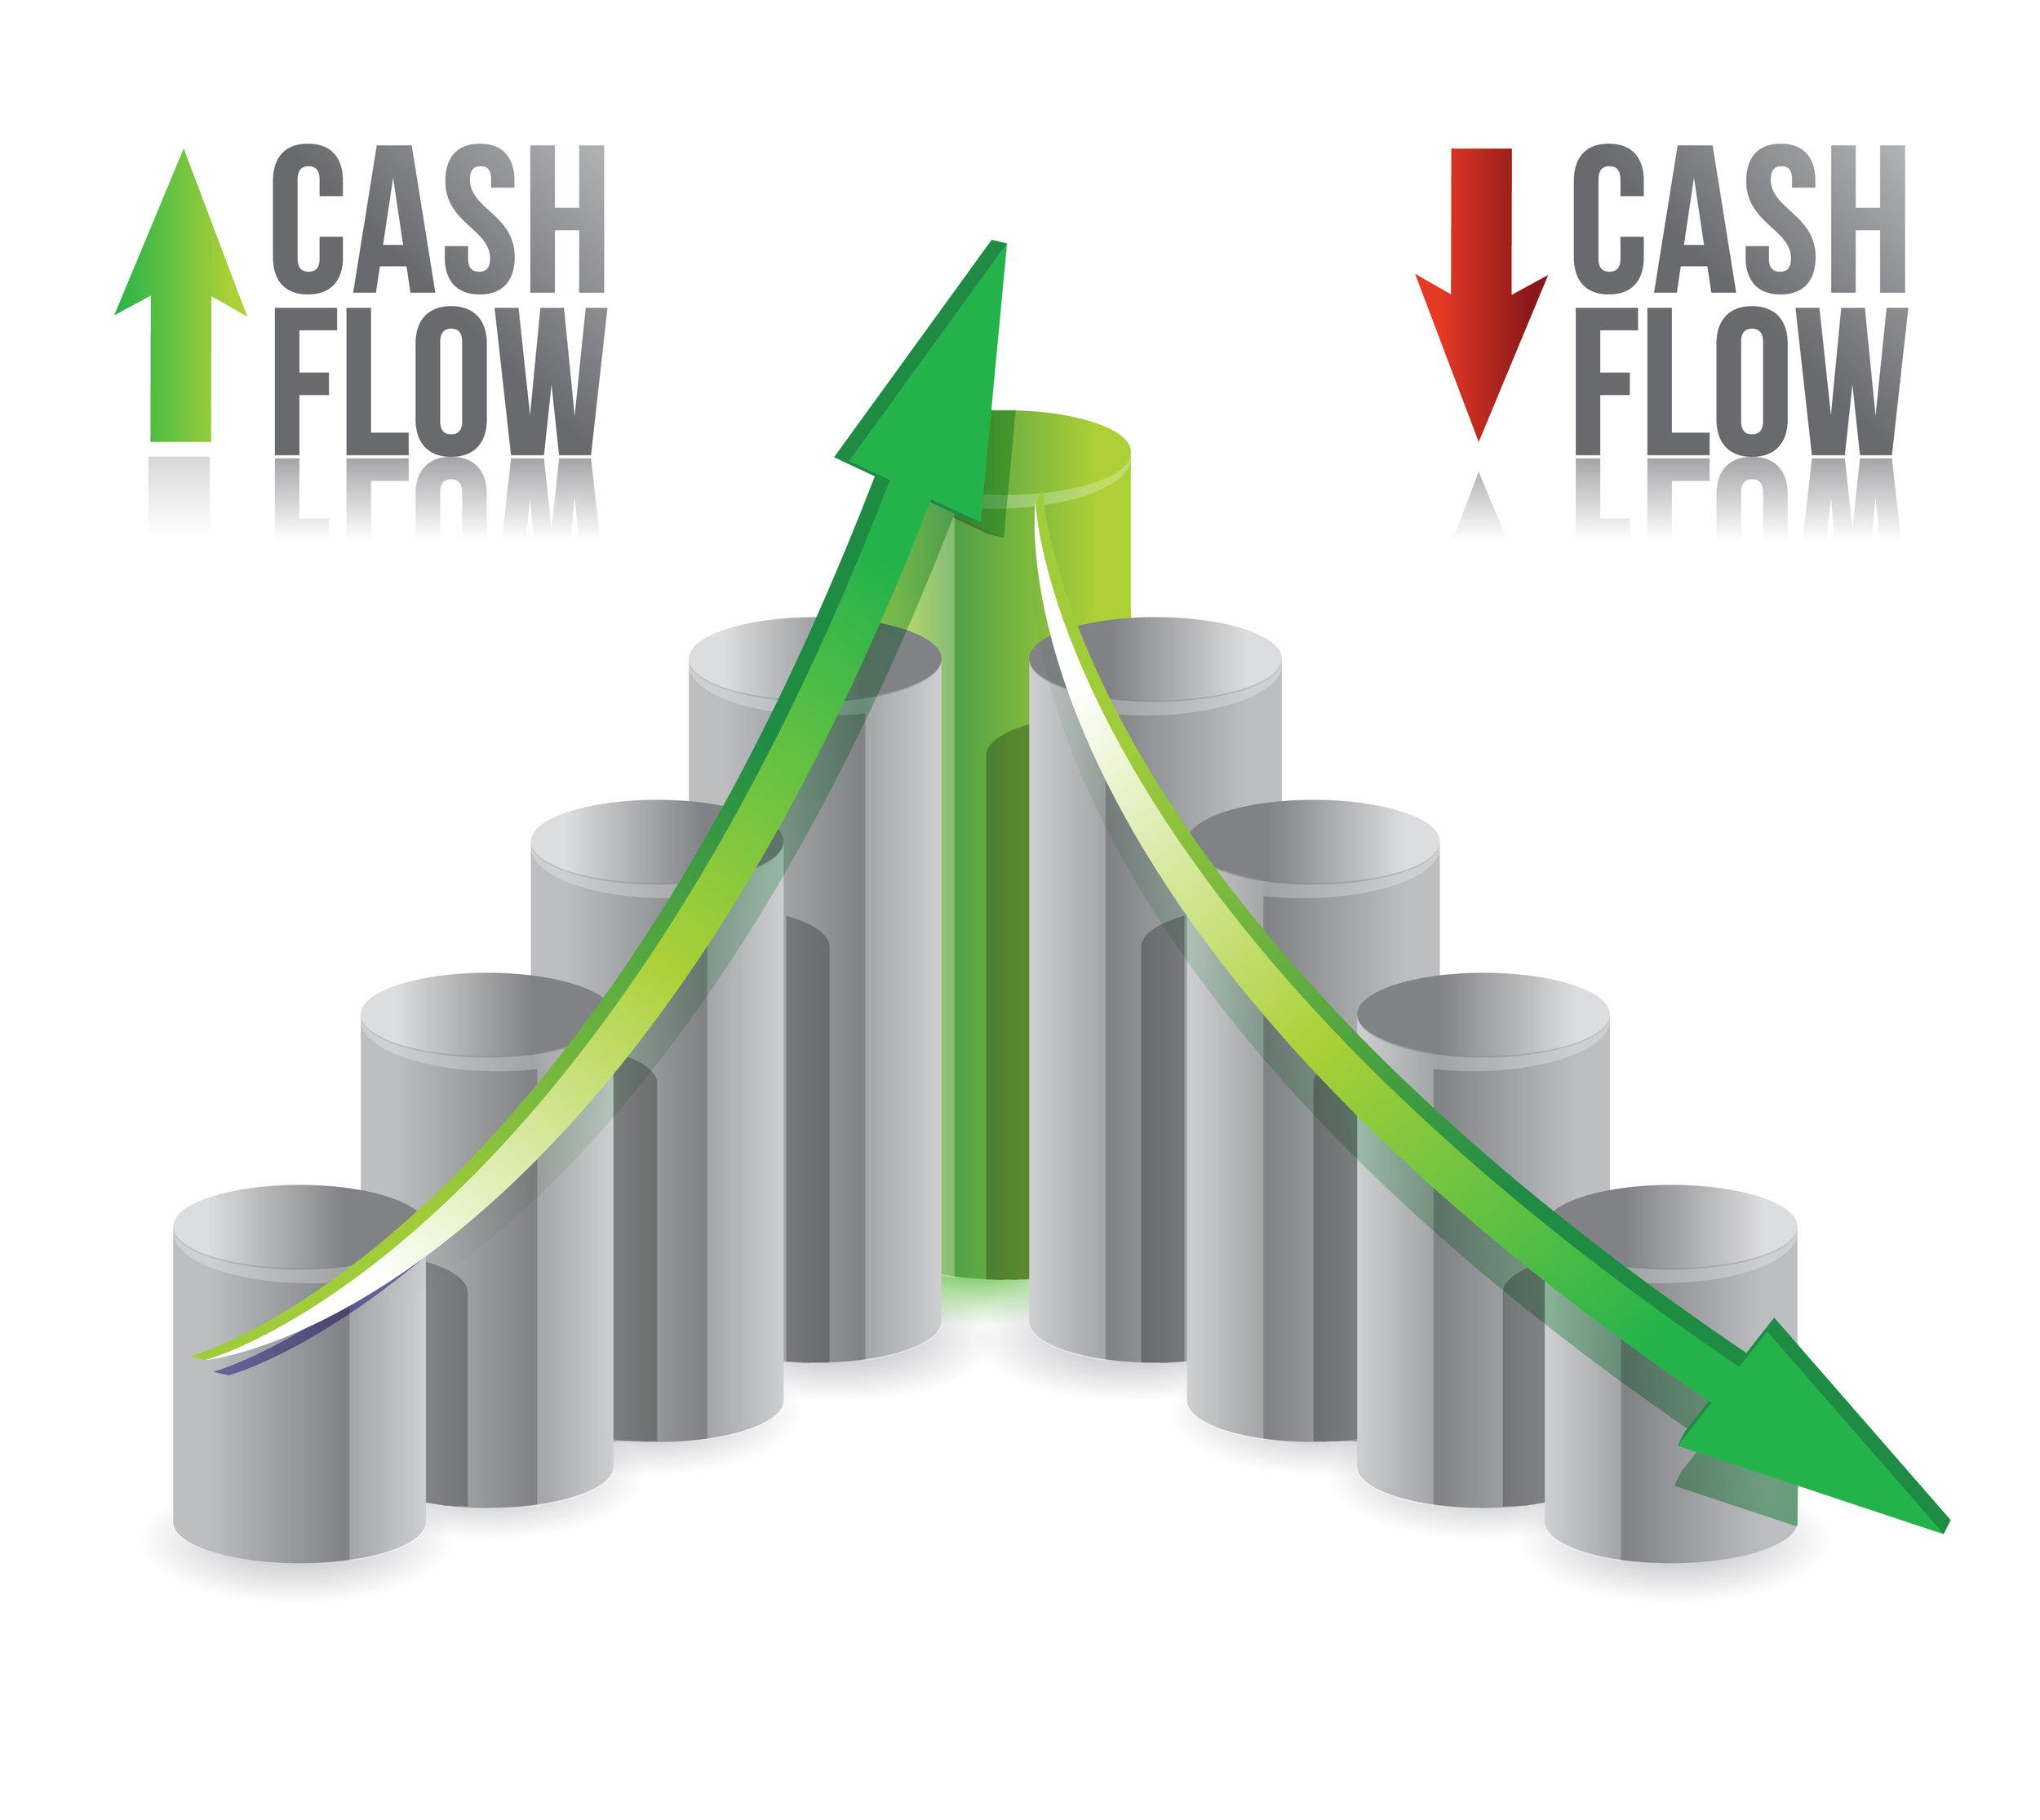 Cashflow-71216.jpeg